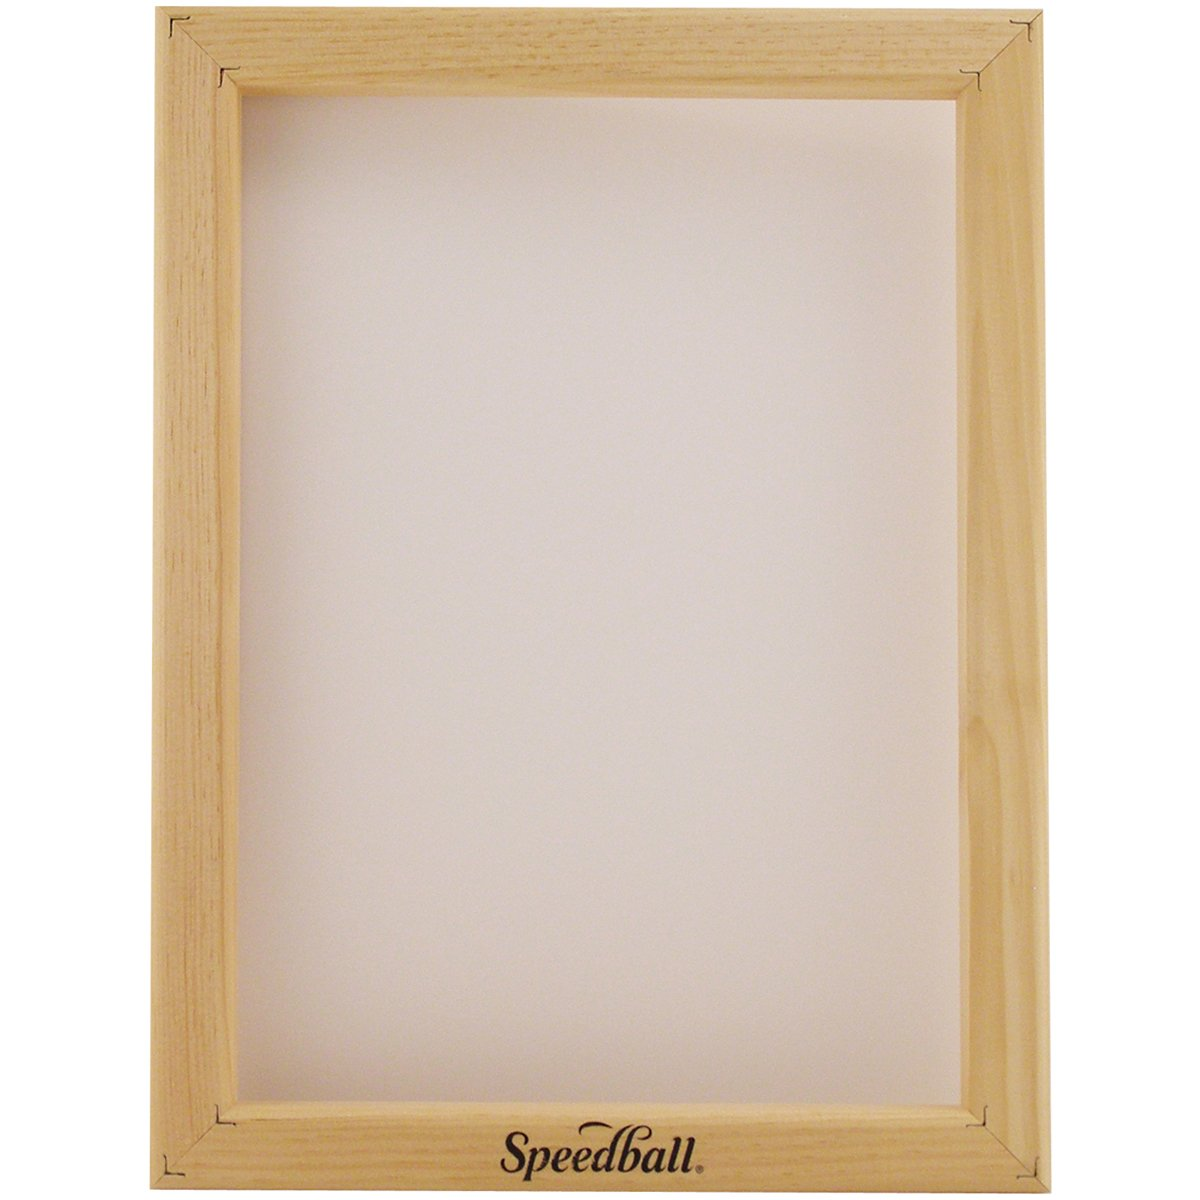 Speedball 10-Inch-by-12-Inch Screen Printing Frame 4715